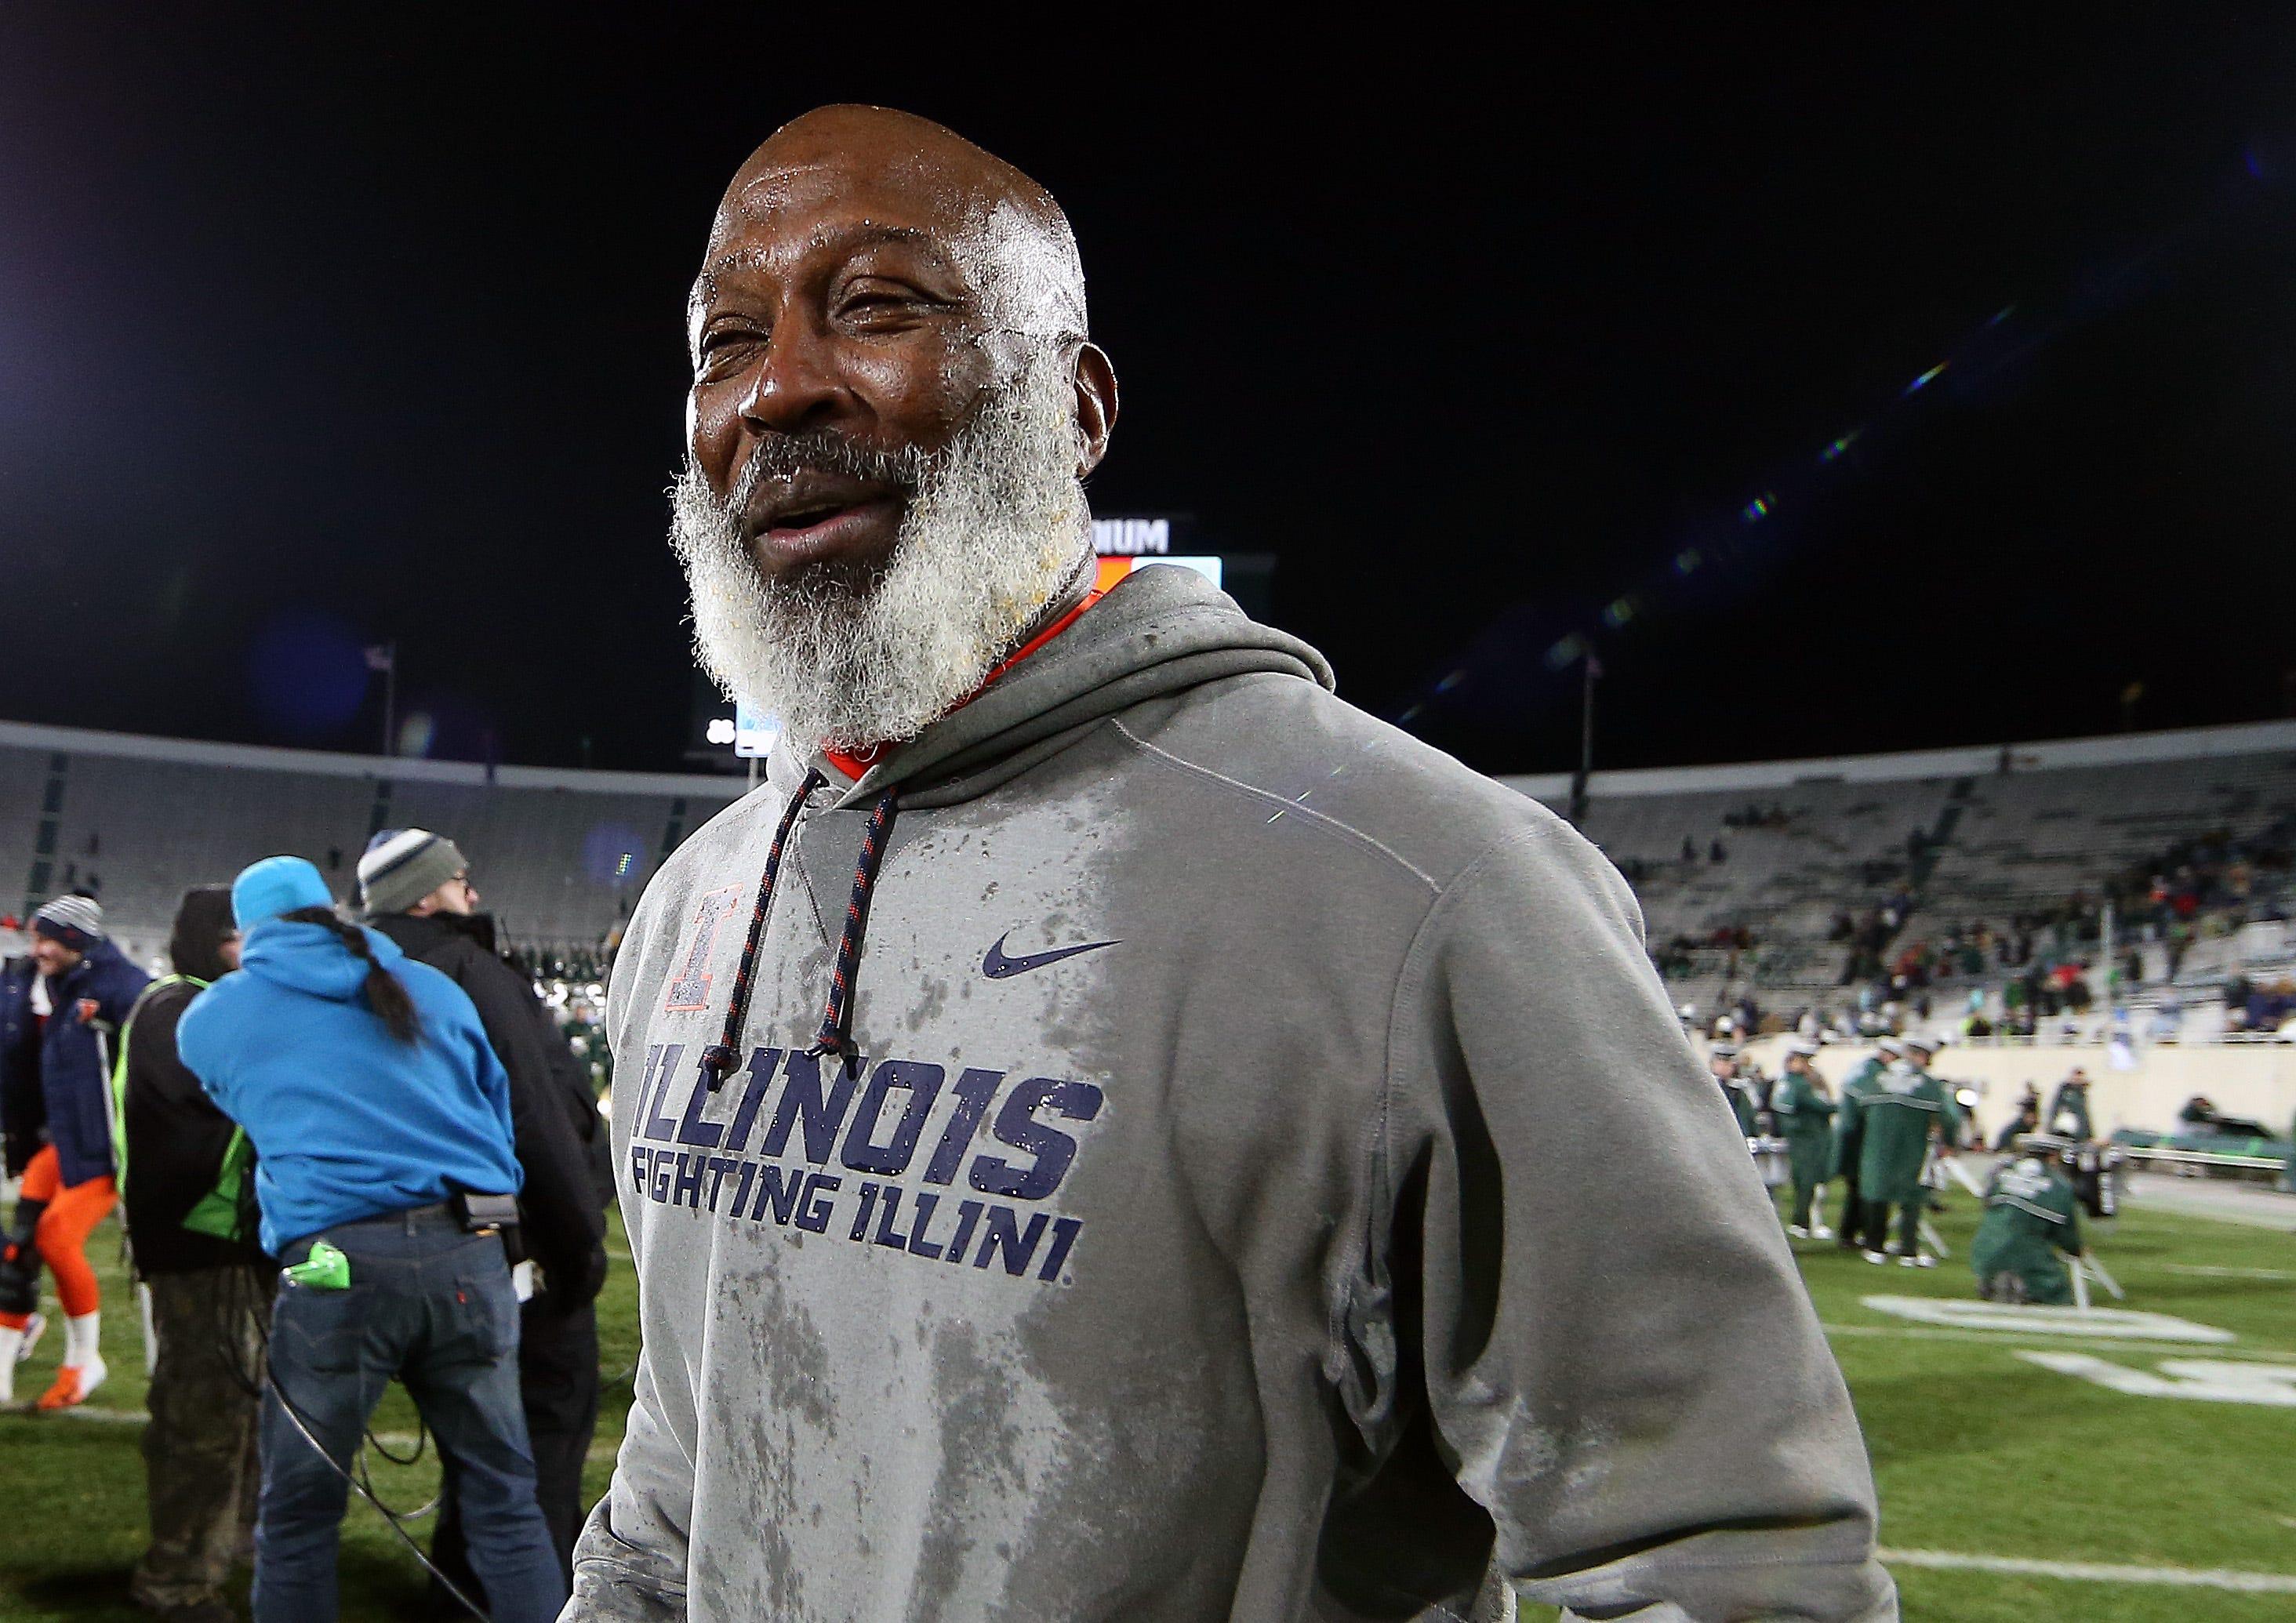 Illinois fires head coach Lovie Smith after five seasons